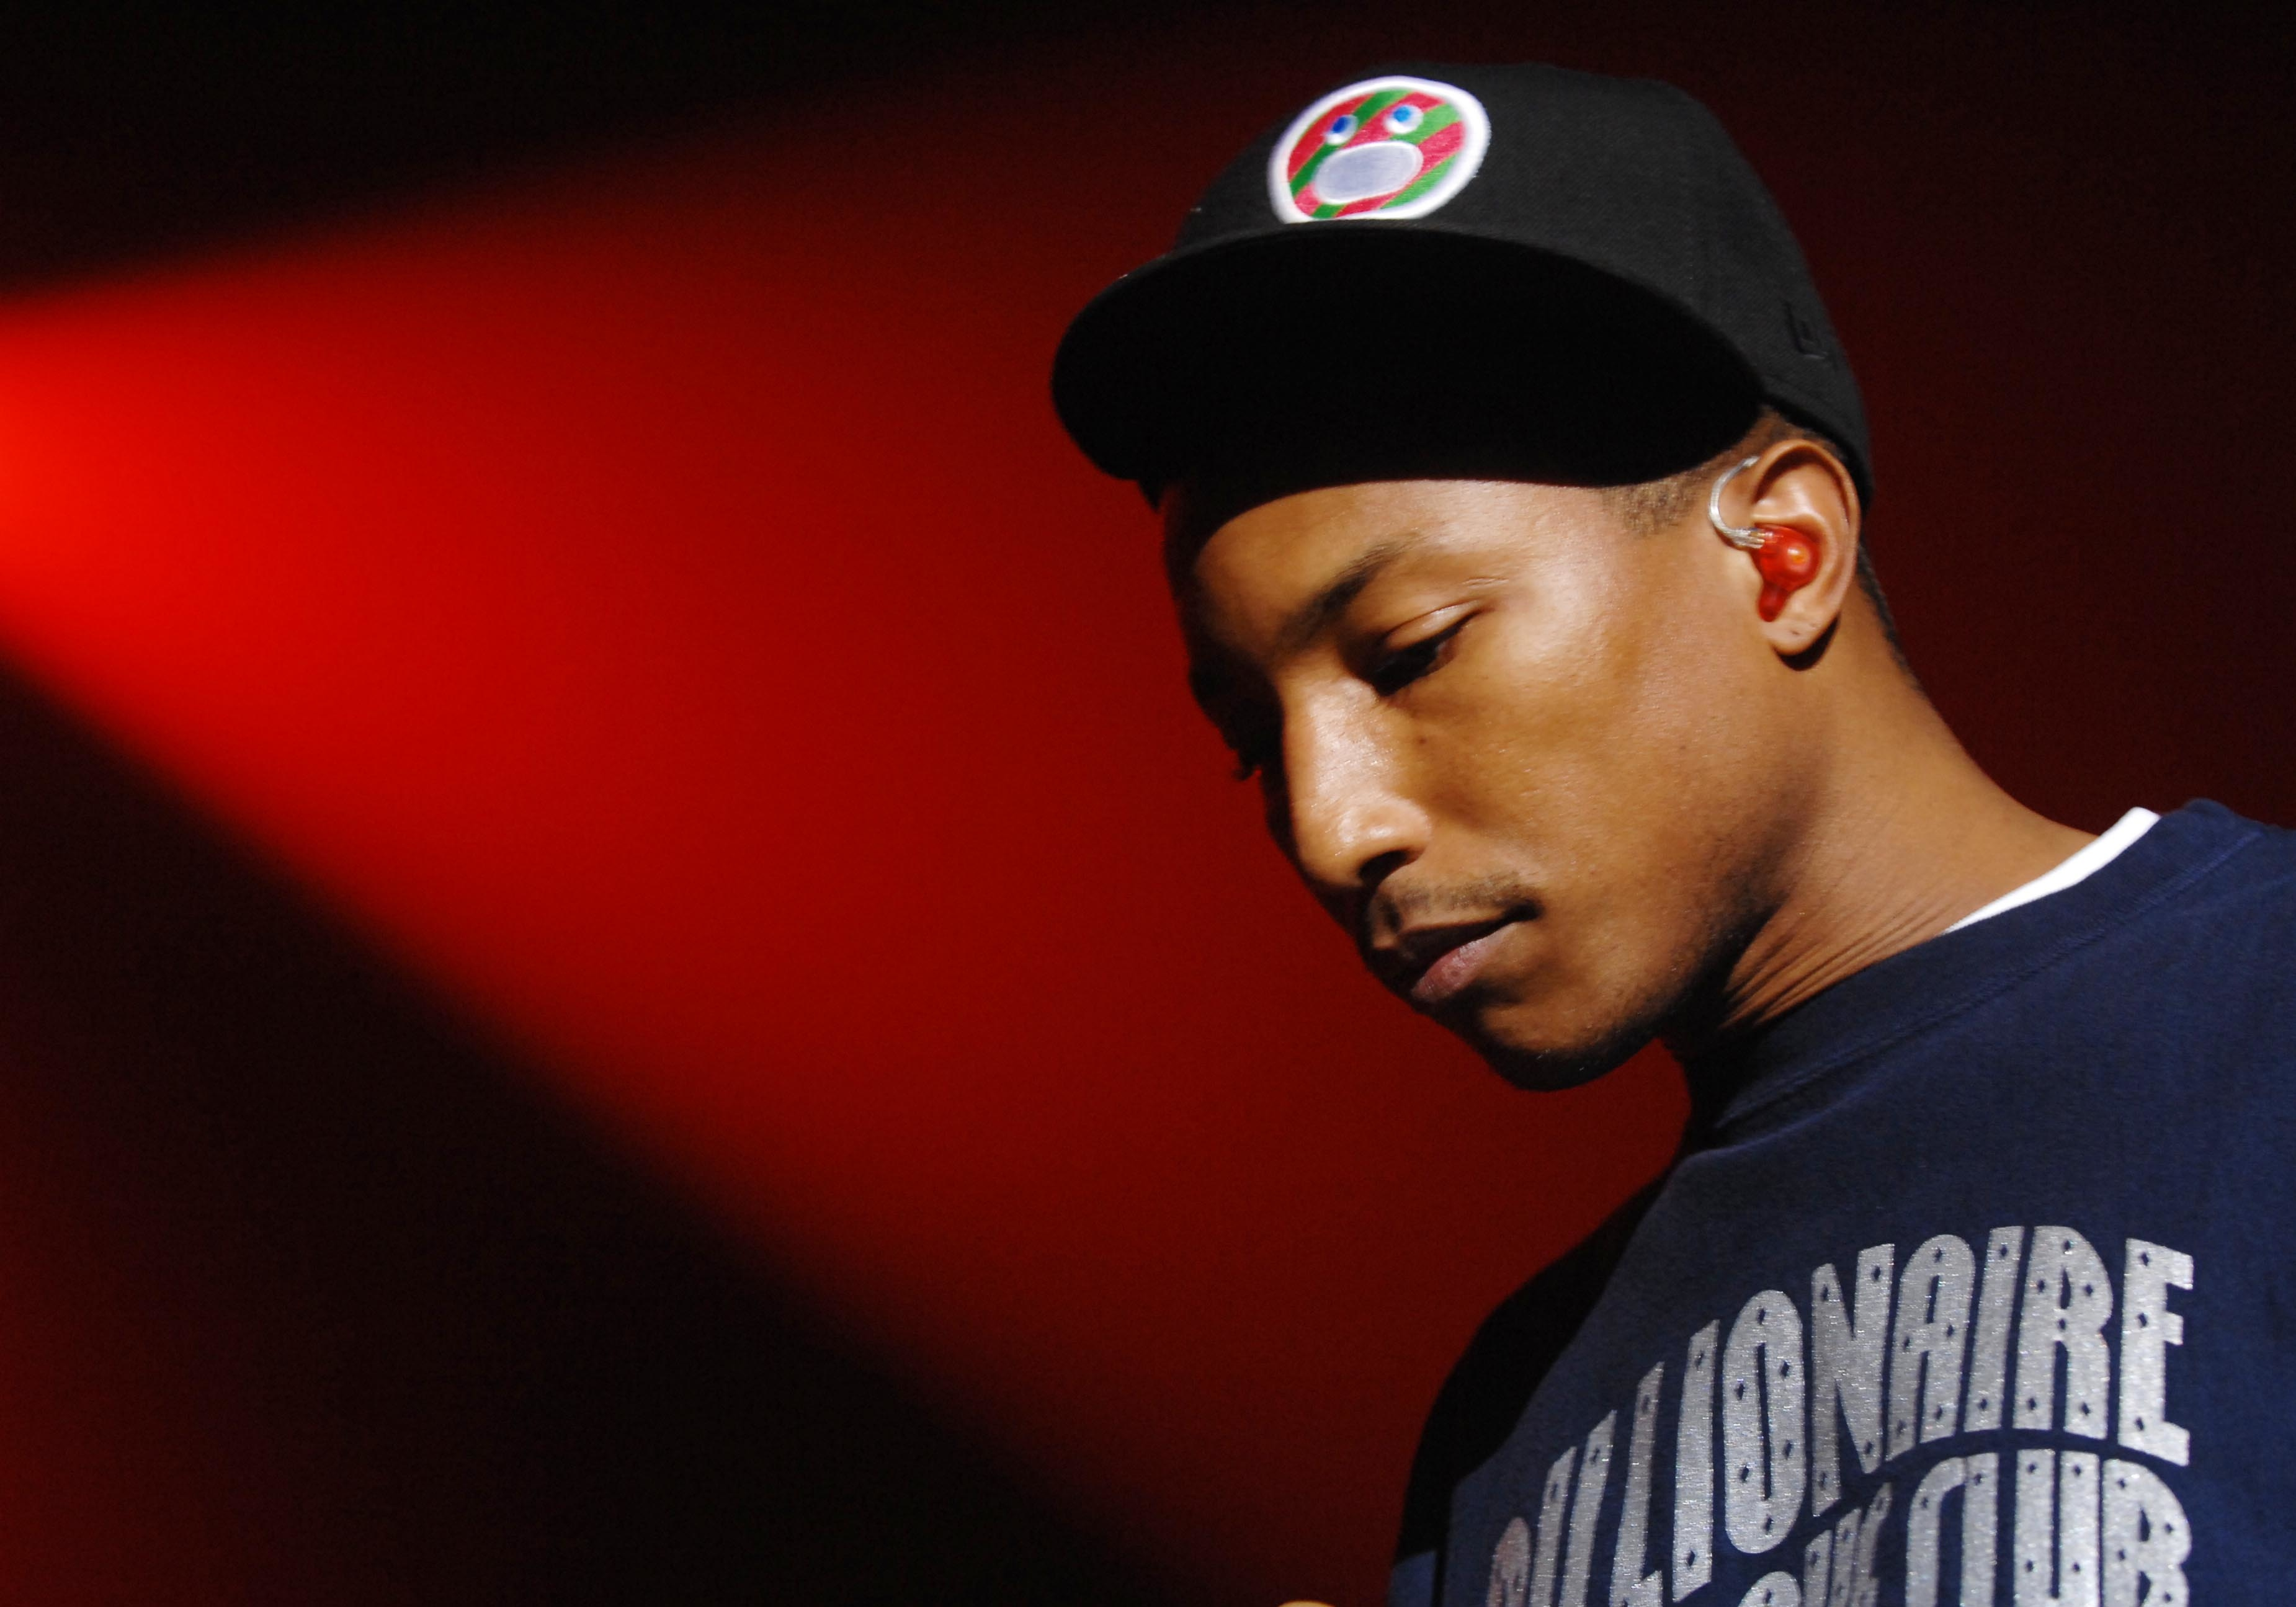 UK - Pharrell Williams Performs in London